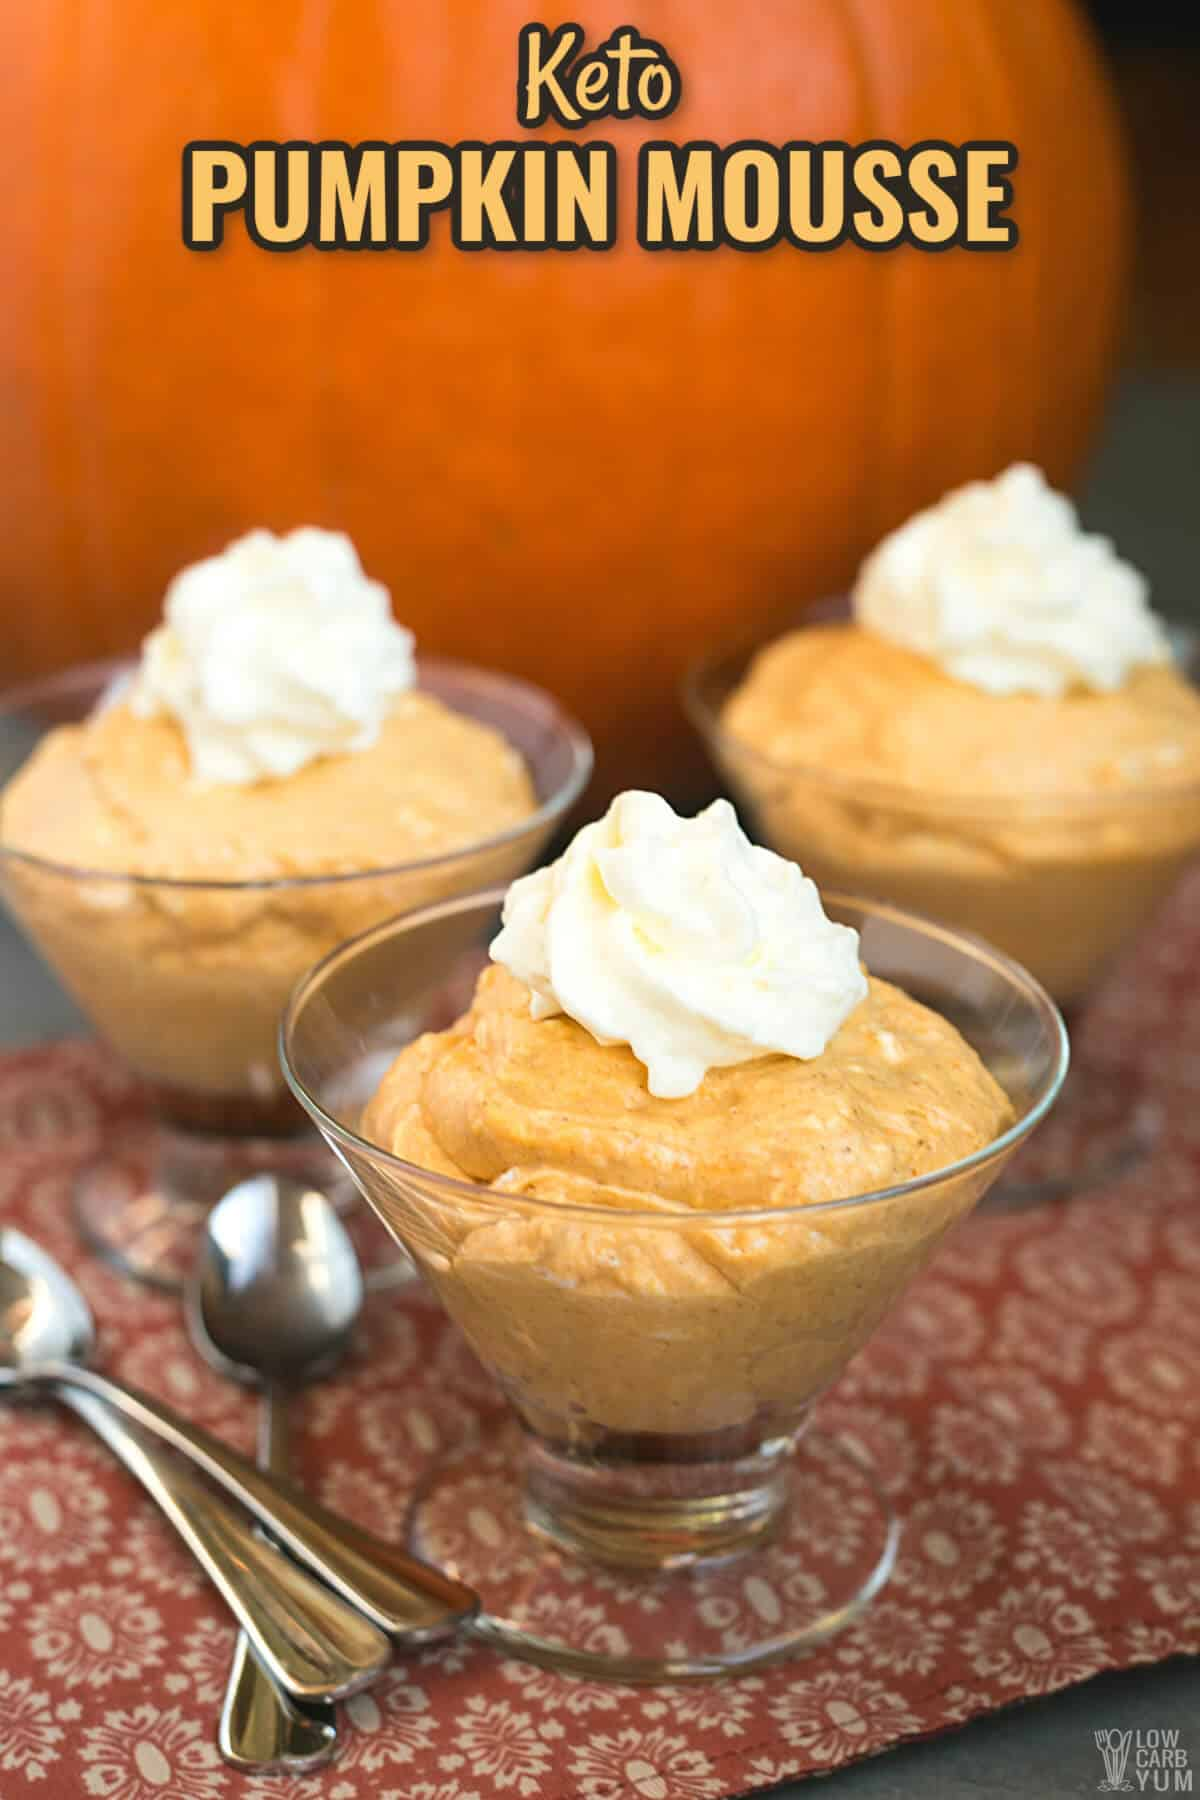 keto pumpkin mousse cover image